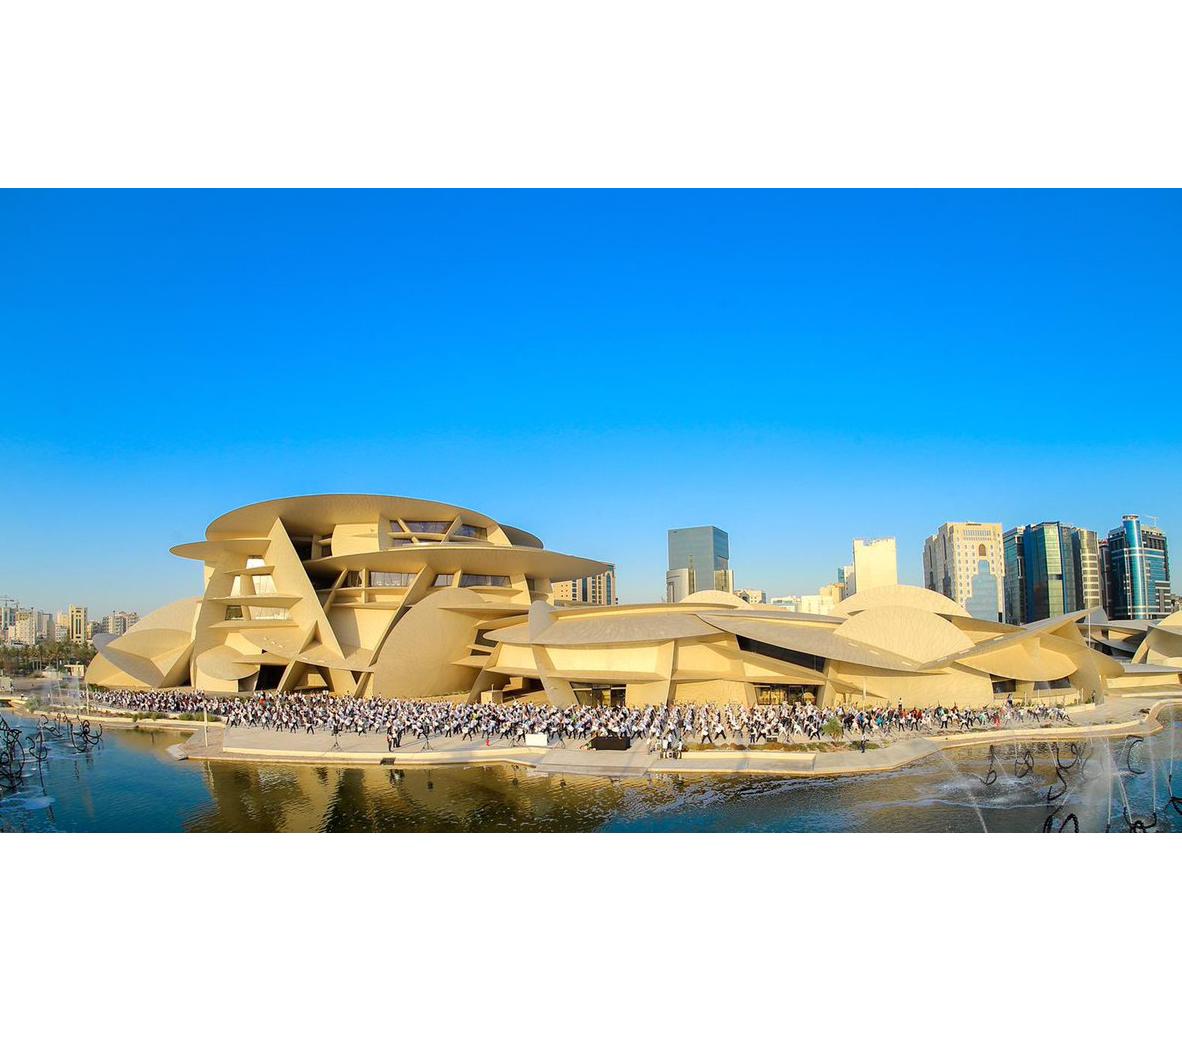 Project Qatar 2019